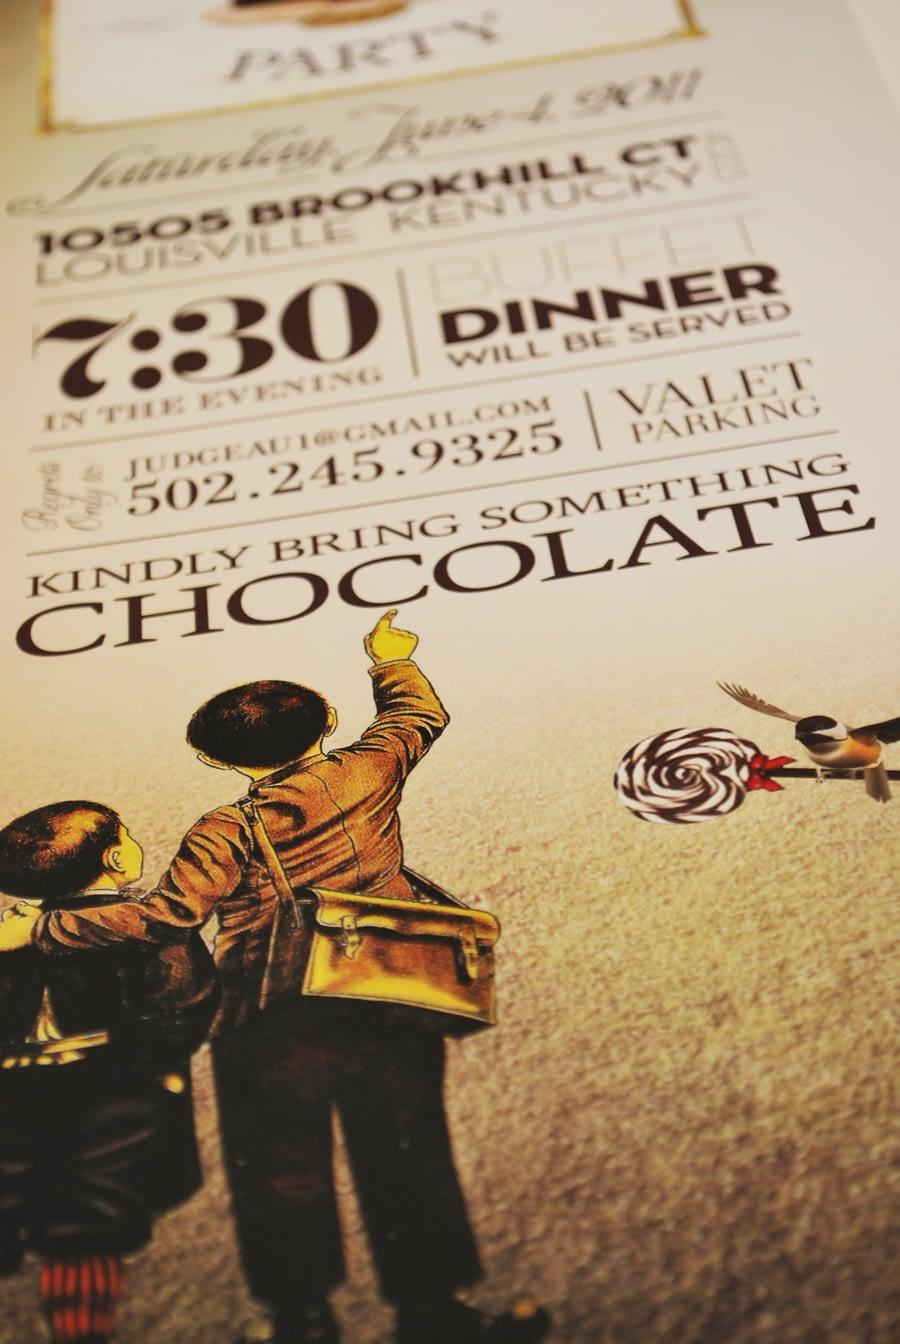 Chocolate Wonderland Chocolate Party Invitation Design Studio Louisville, KY